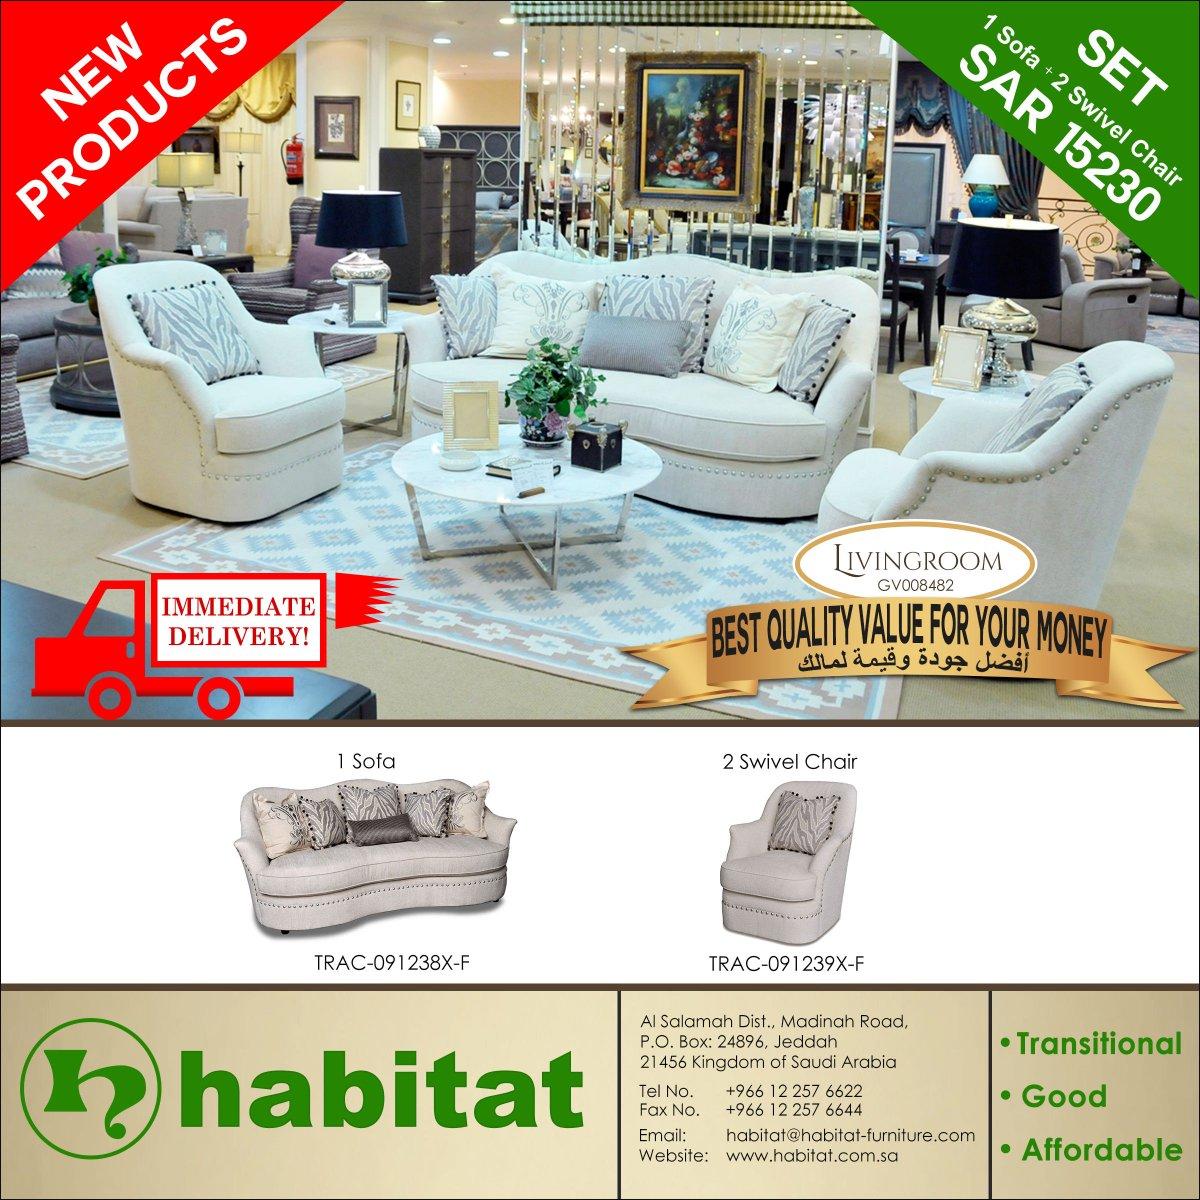 Surprising Living Room Furniture Habitat Gallery